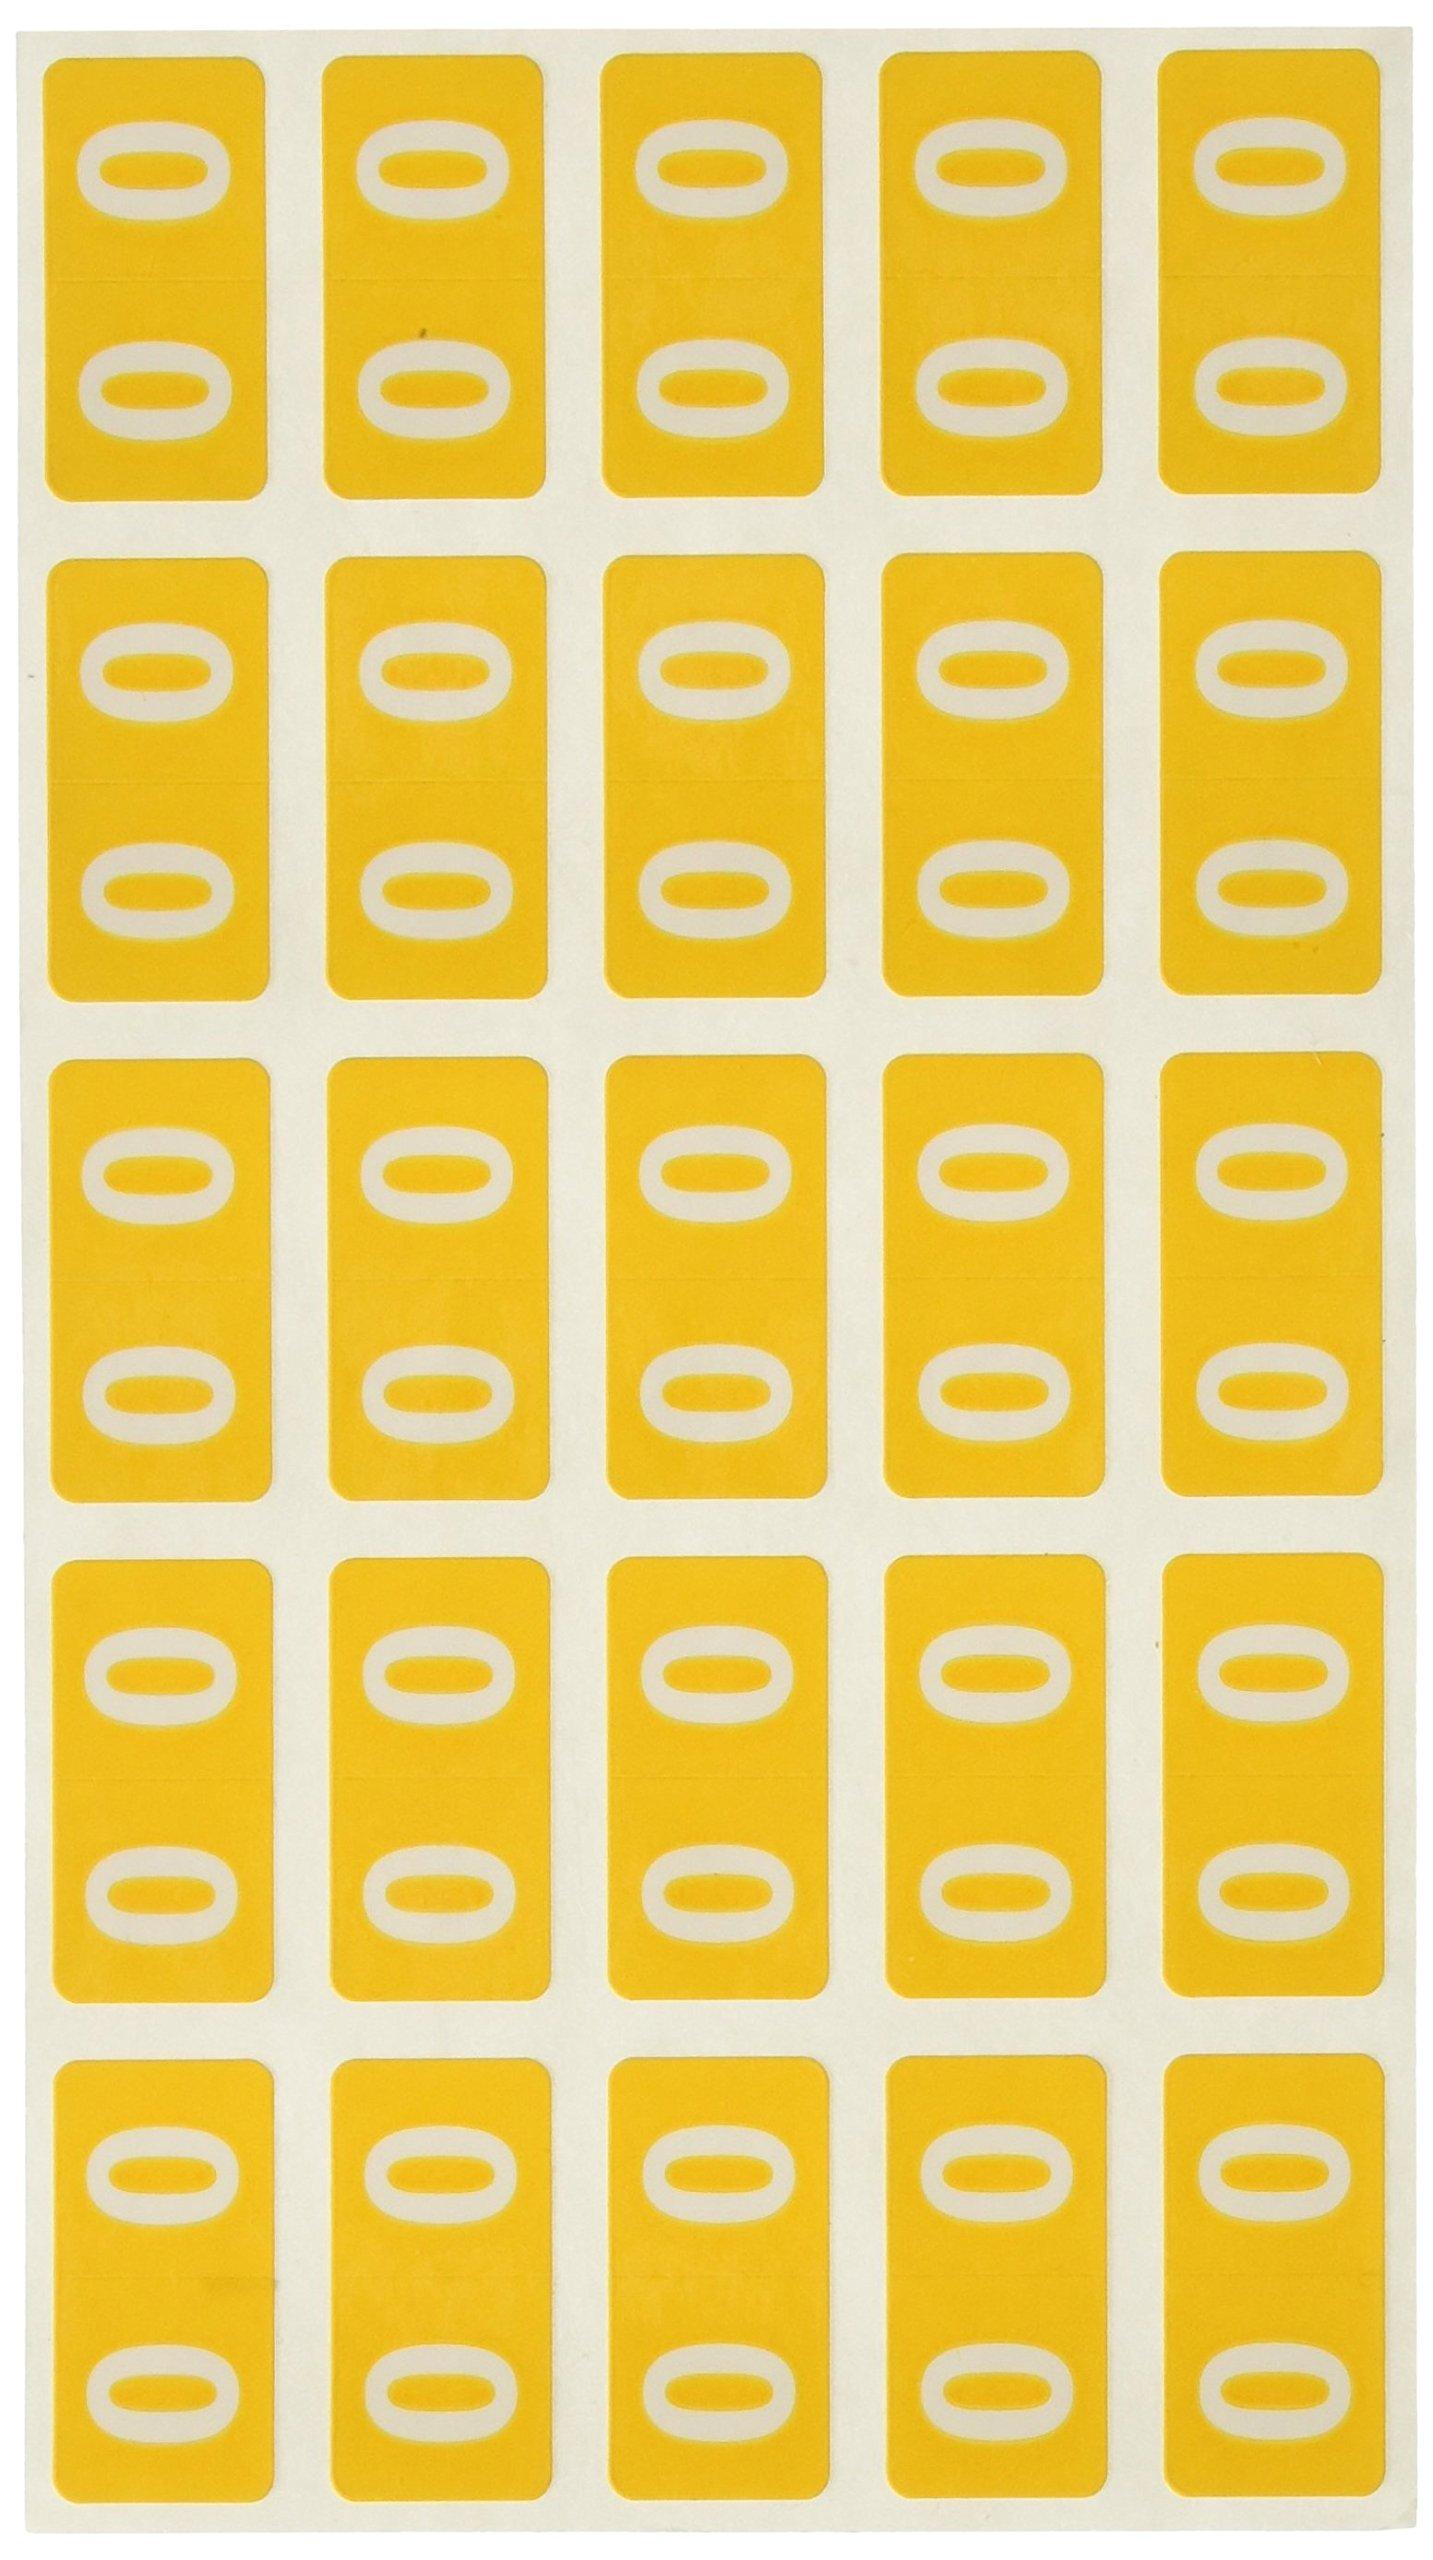 SMEAD COMPATIBLE ETSN-ADU Etsn Color Code Label, Permanent, Numeric 1'' x 1/2, Assorted Colors, 250 per Pack, 10 Packs per Set (Pack of 100)